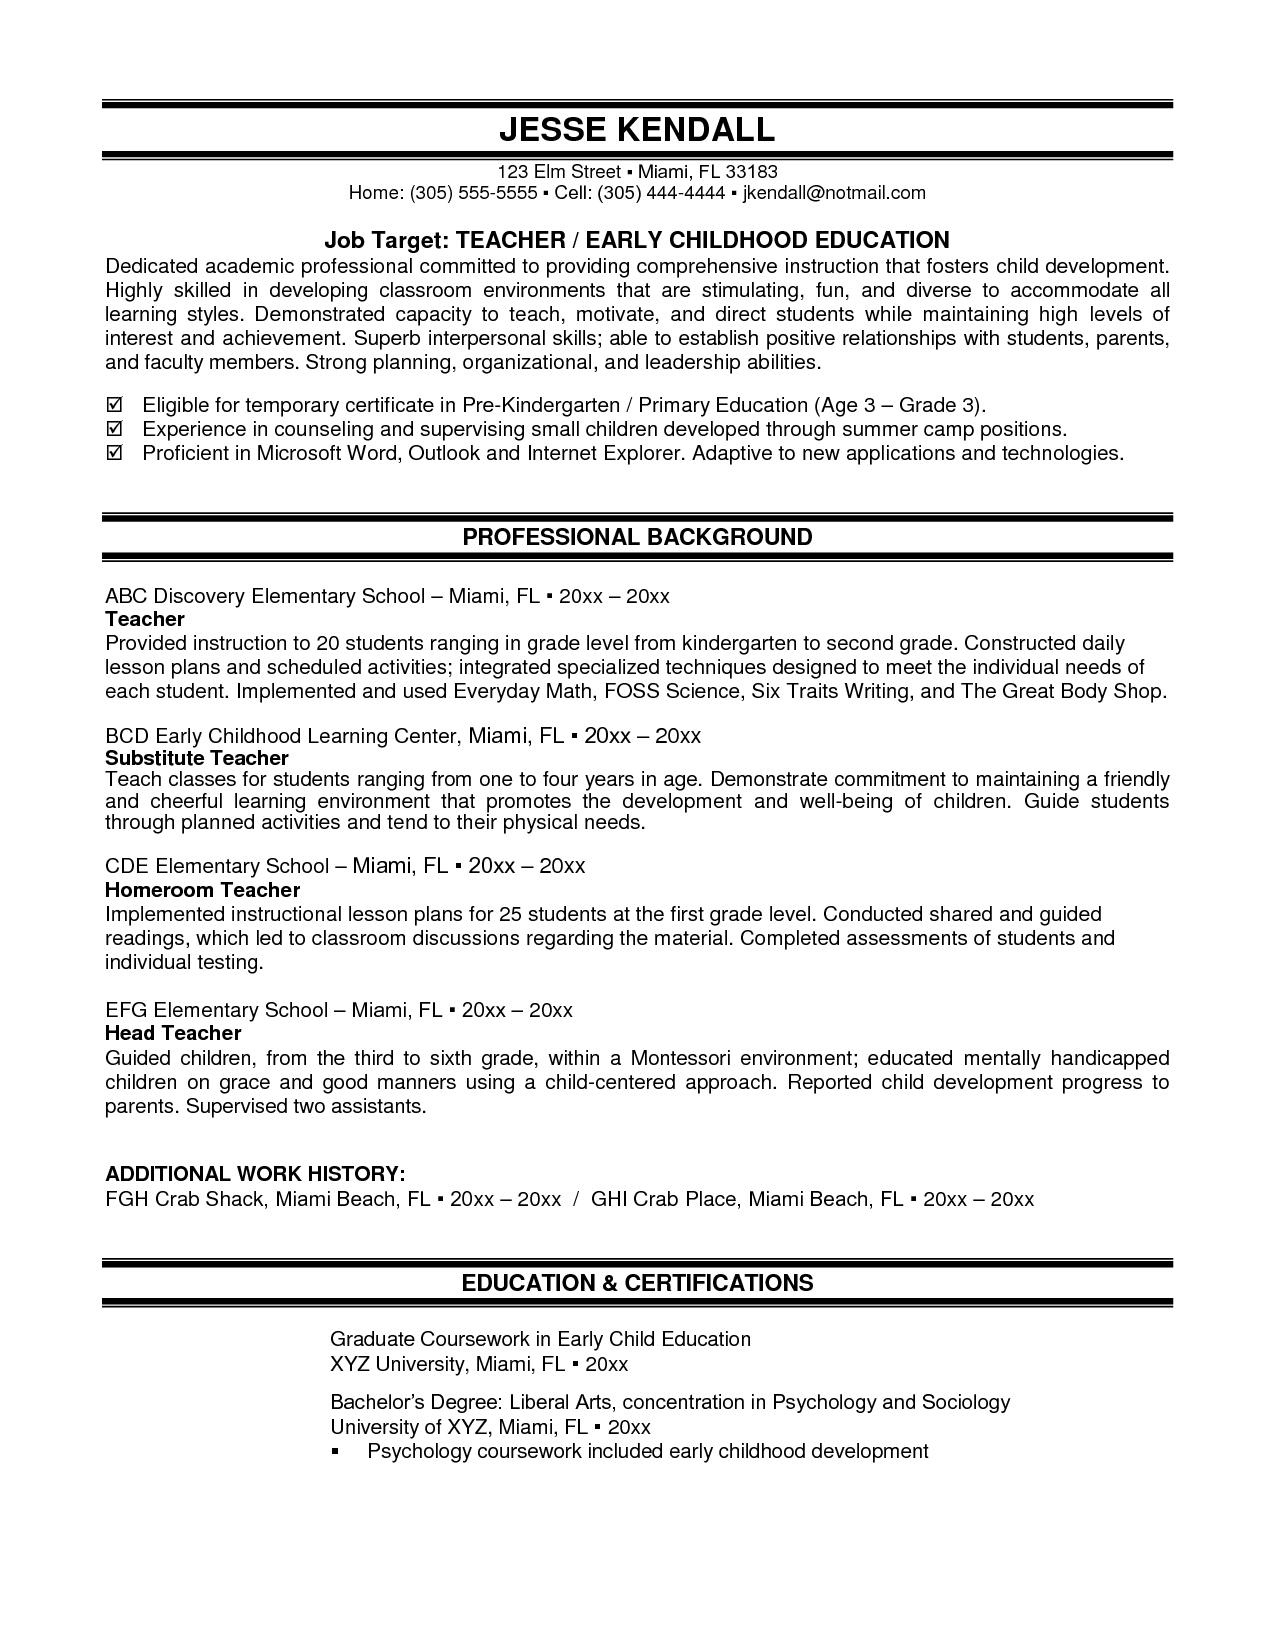 Pin By Resumejob On Resume Job Sample Resume Resume Resume Examples